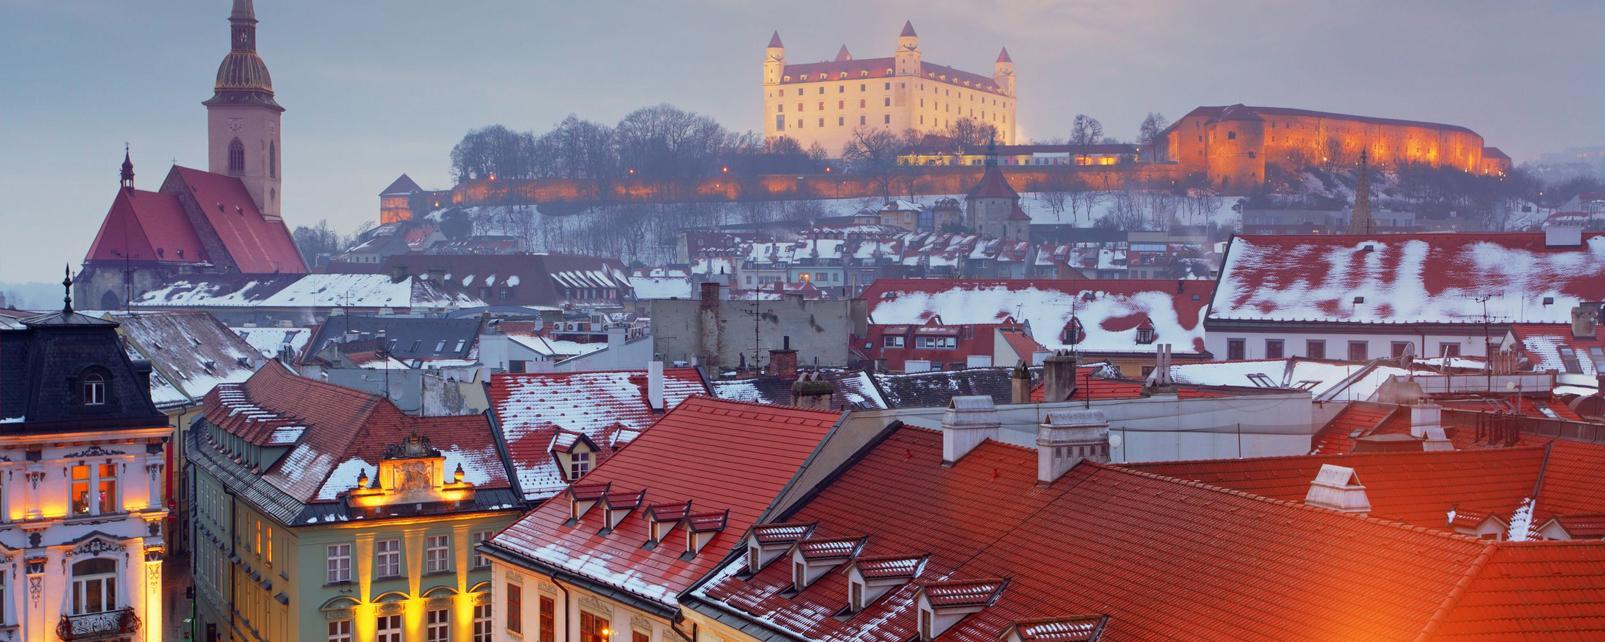 Eslovaquia Bratislava